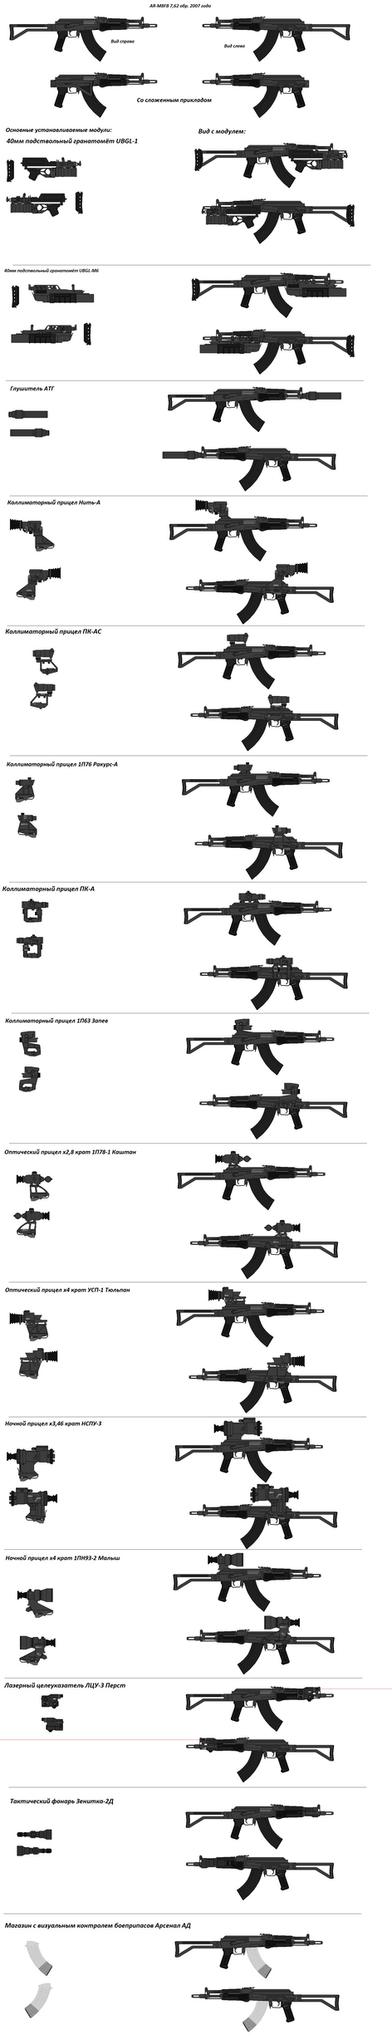 AR-M8FB 7,62 (2007) by IoshkinKot